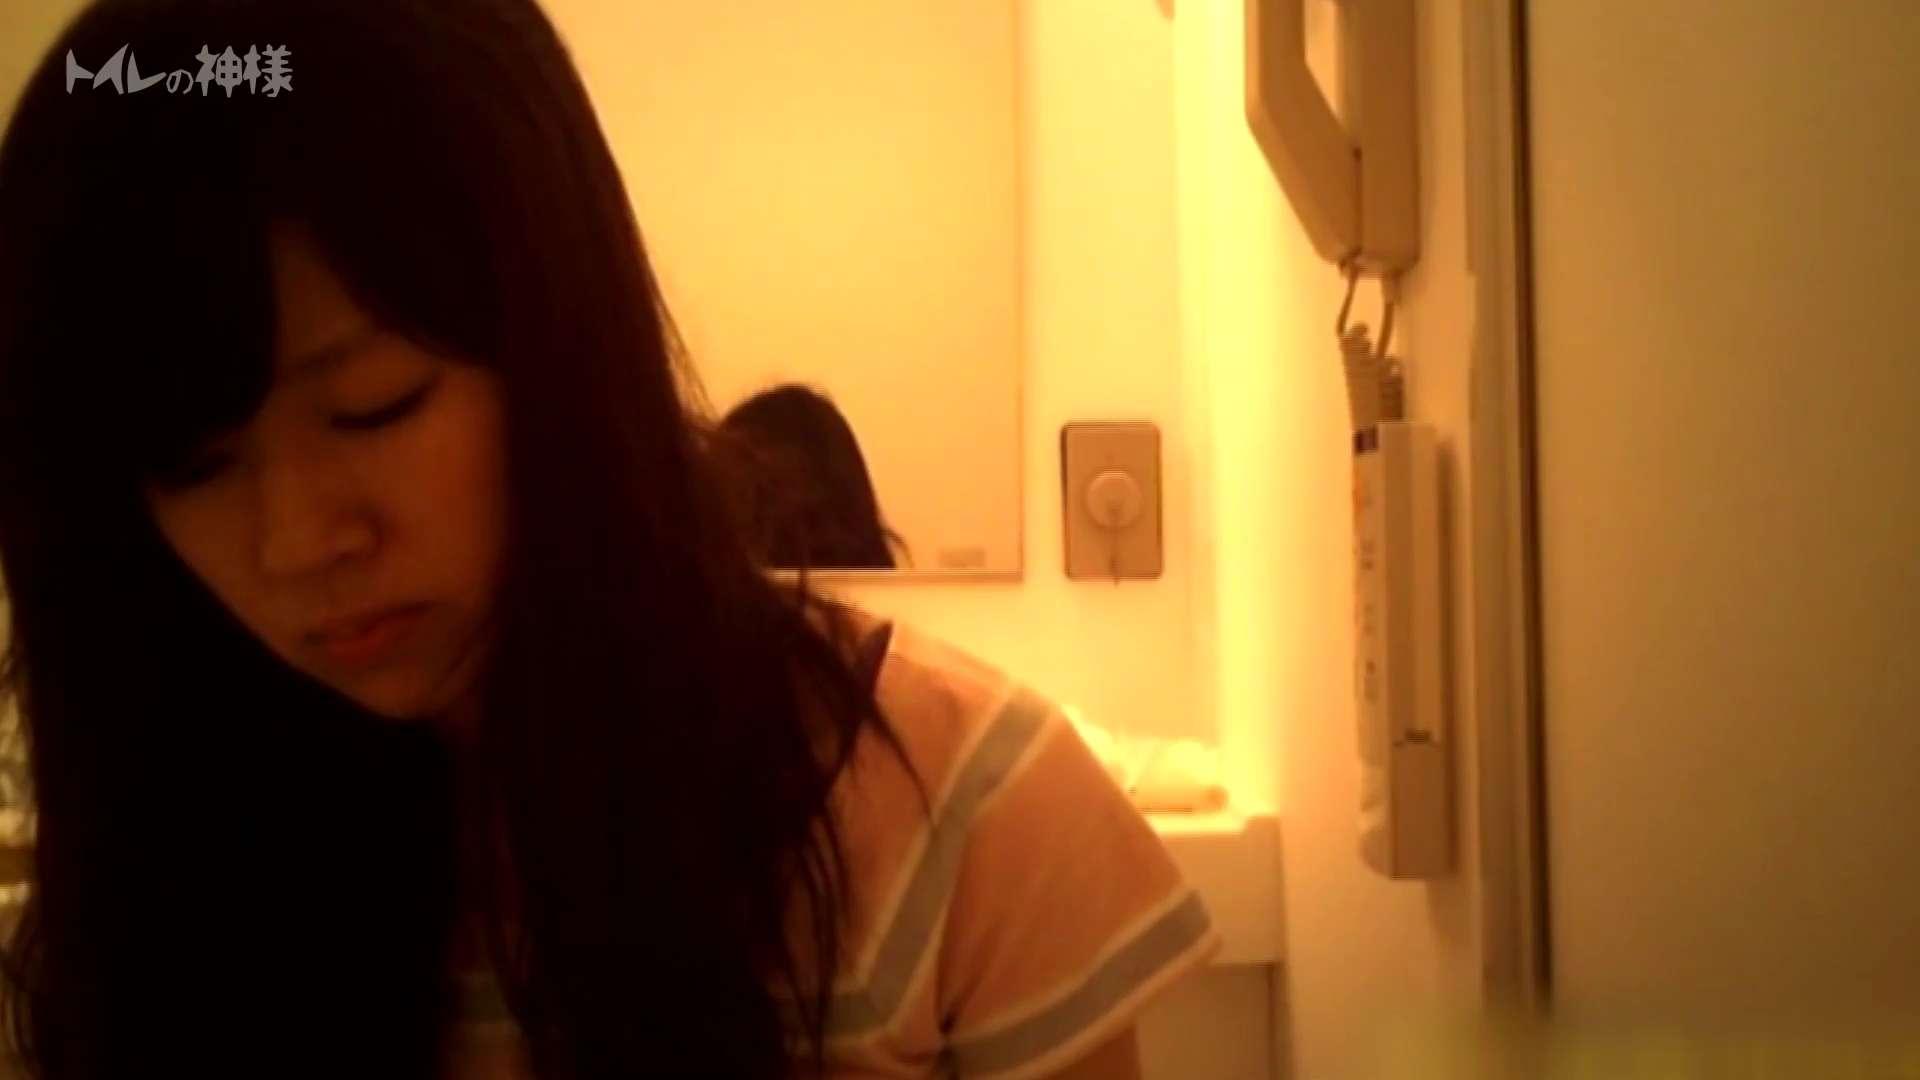 Vol.04 女子大生のトイレ恥態 トイレ盗撮 | 丸見え  92枚 7